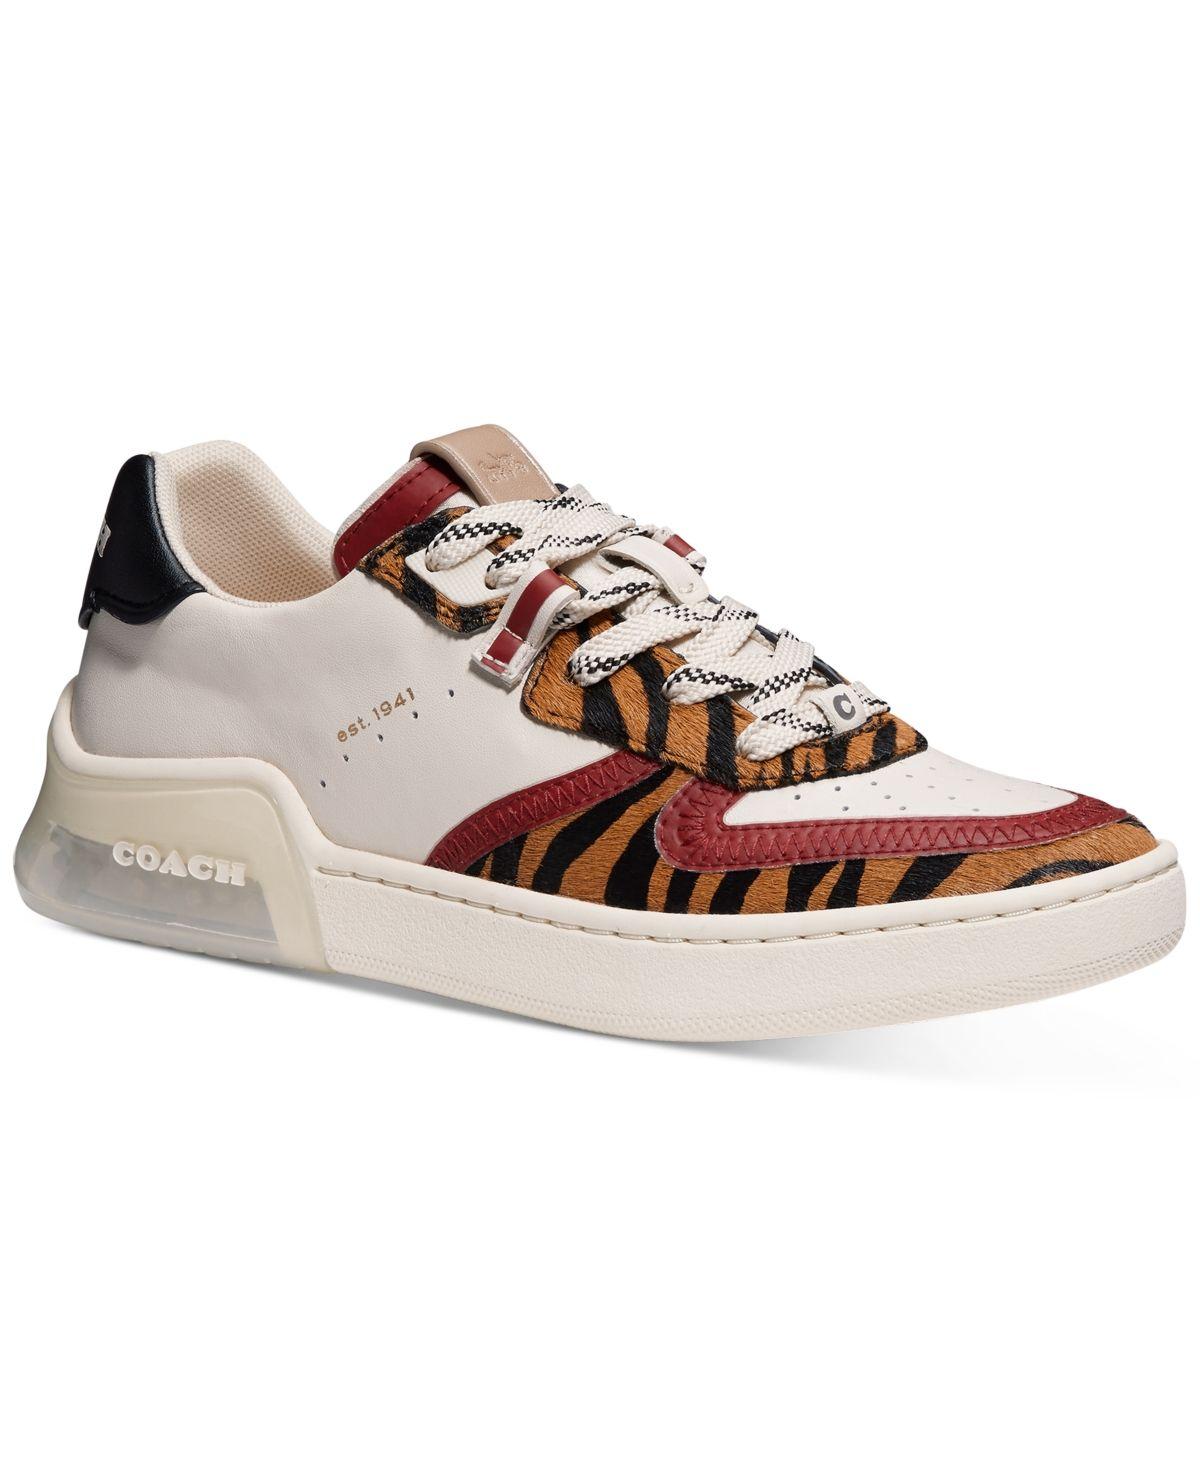 38+ Coach tennis shoes for women ideas information